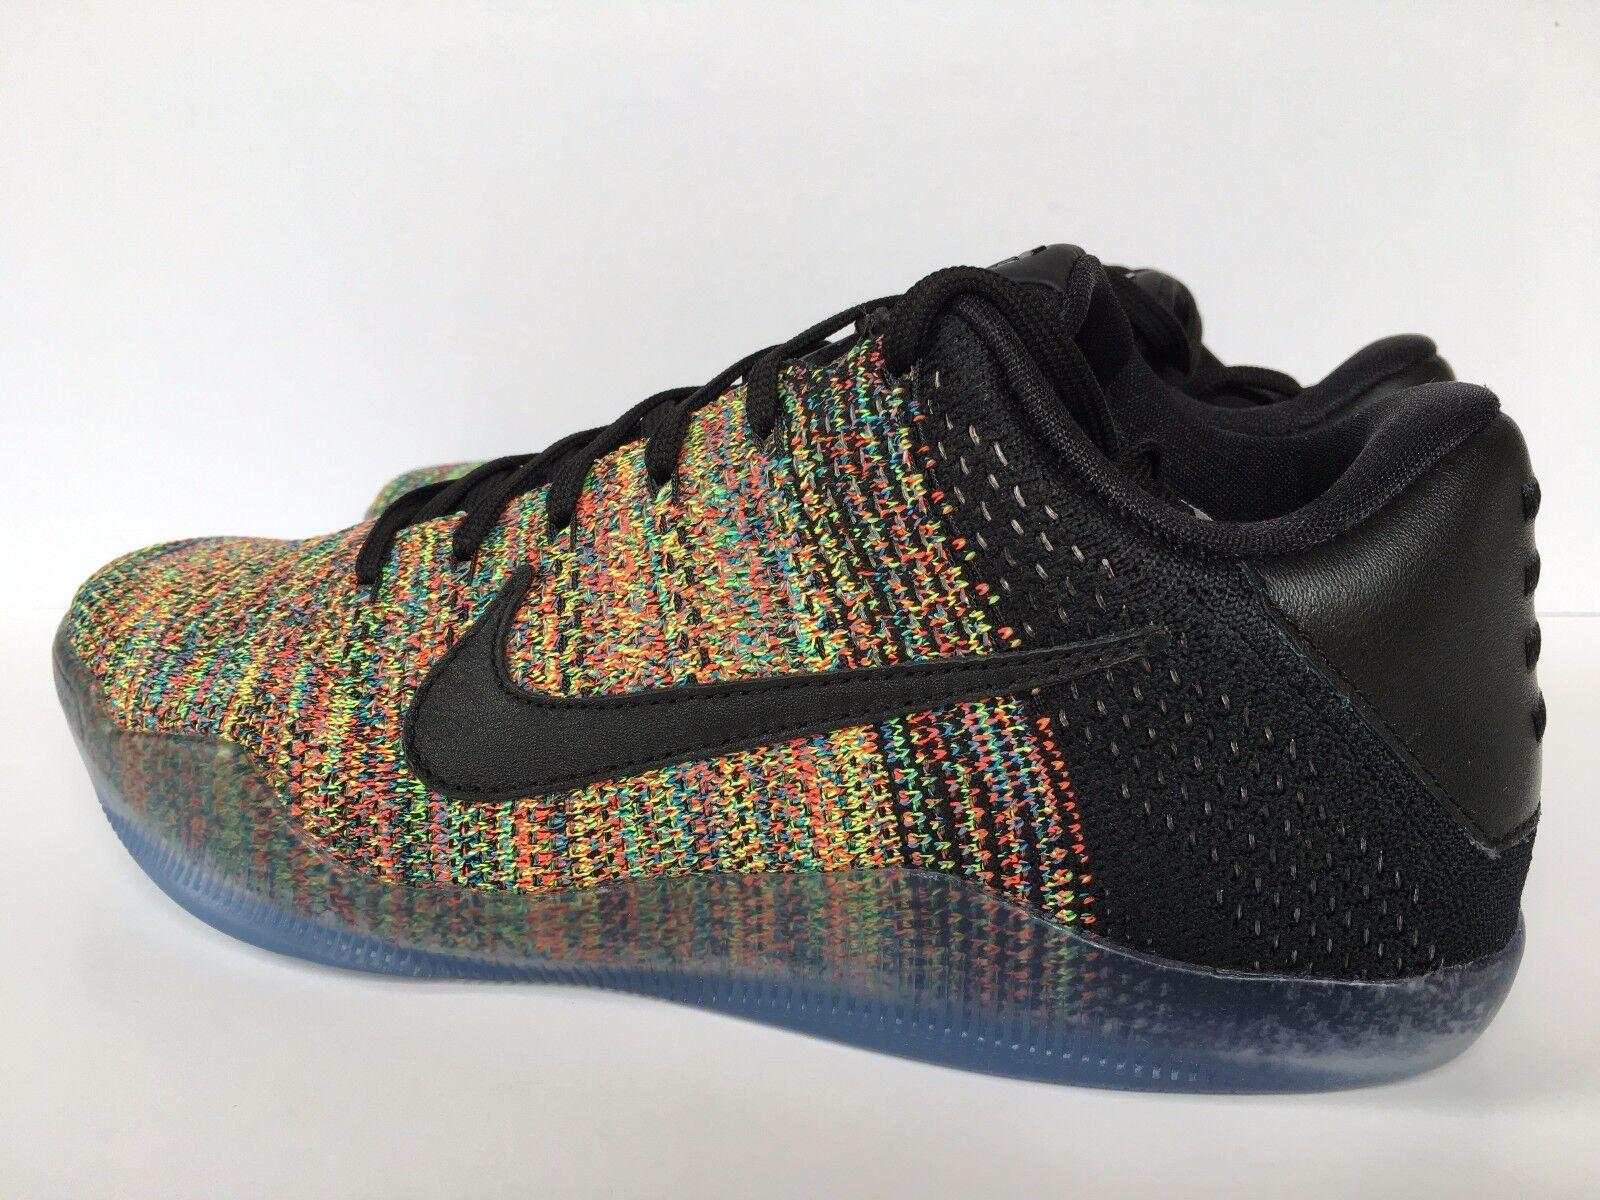 483fa7337185a ... Nike Kobe XI Elite Low Flyknit iD Multicolor Multicolor Multicolor 2016 Men  SZ 8  903710 ...